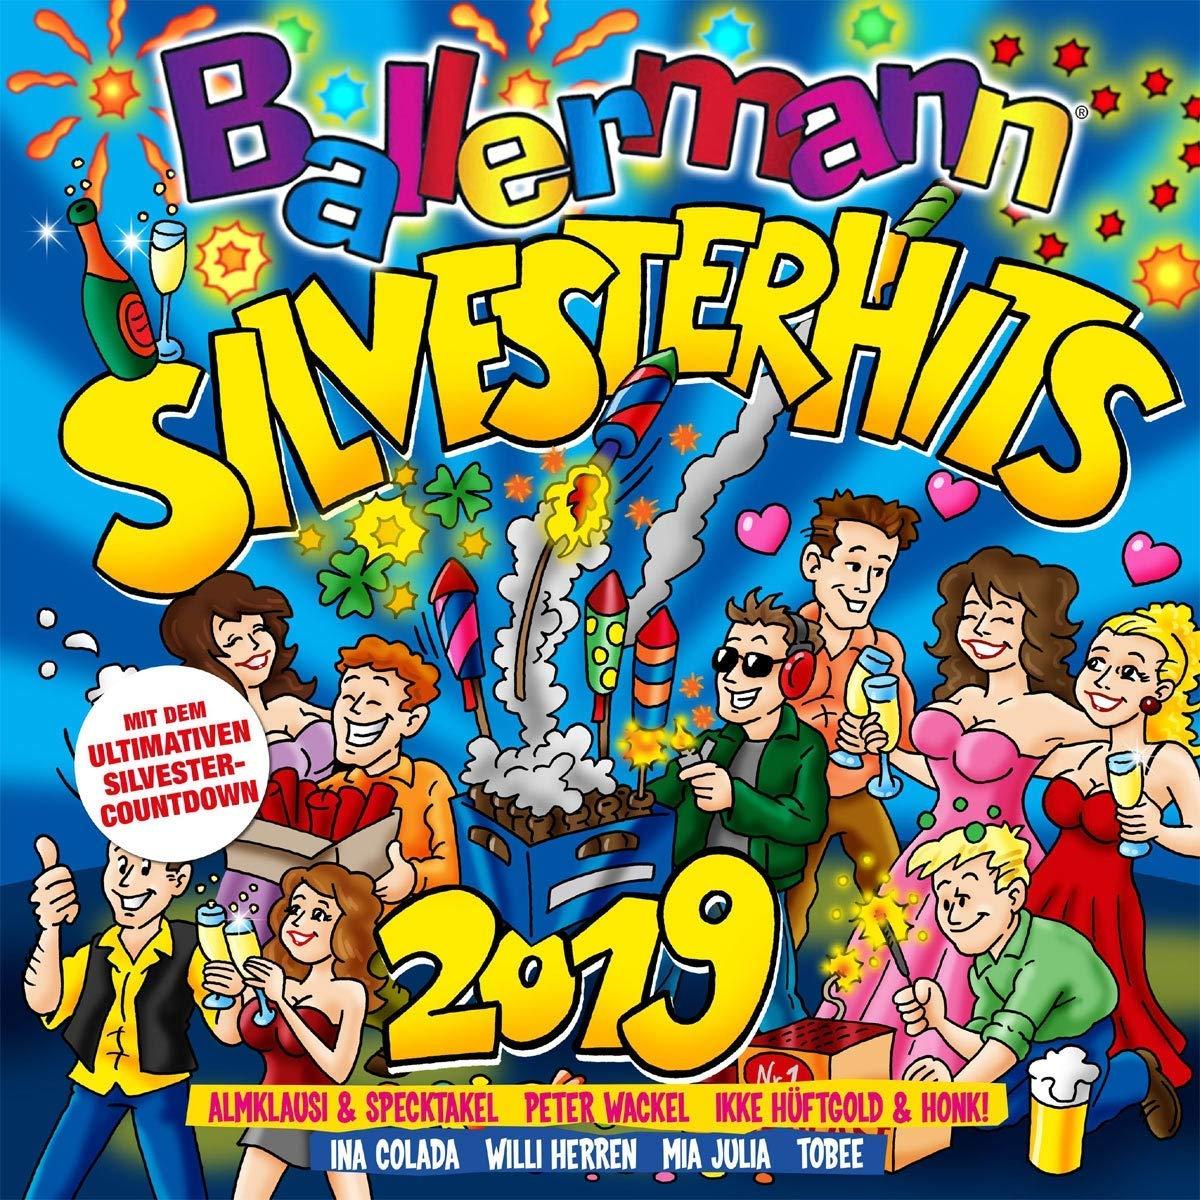 Ballermann Silvesterhits 2019 (2018) MP3